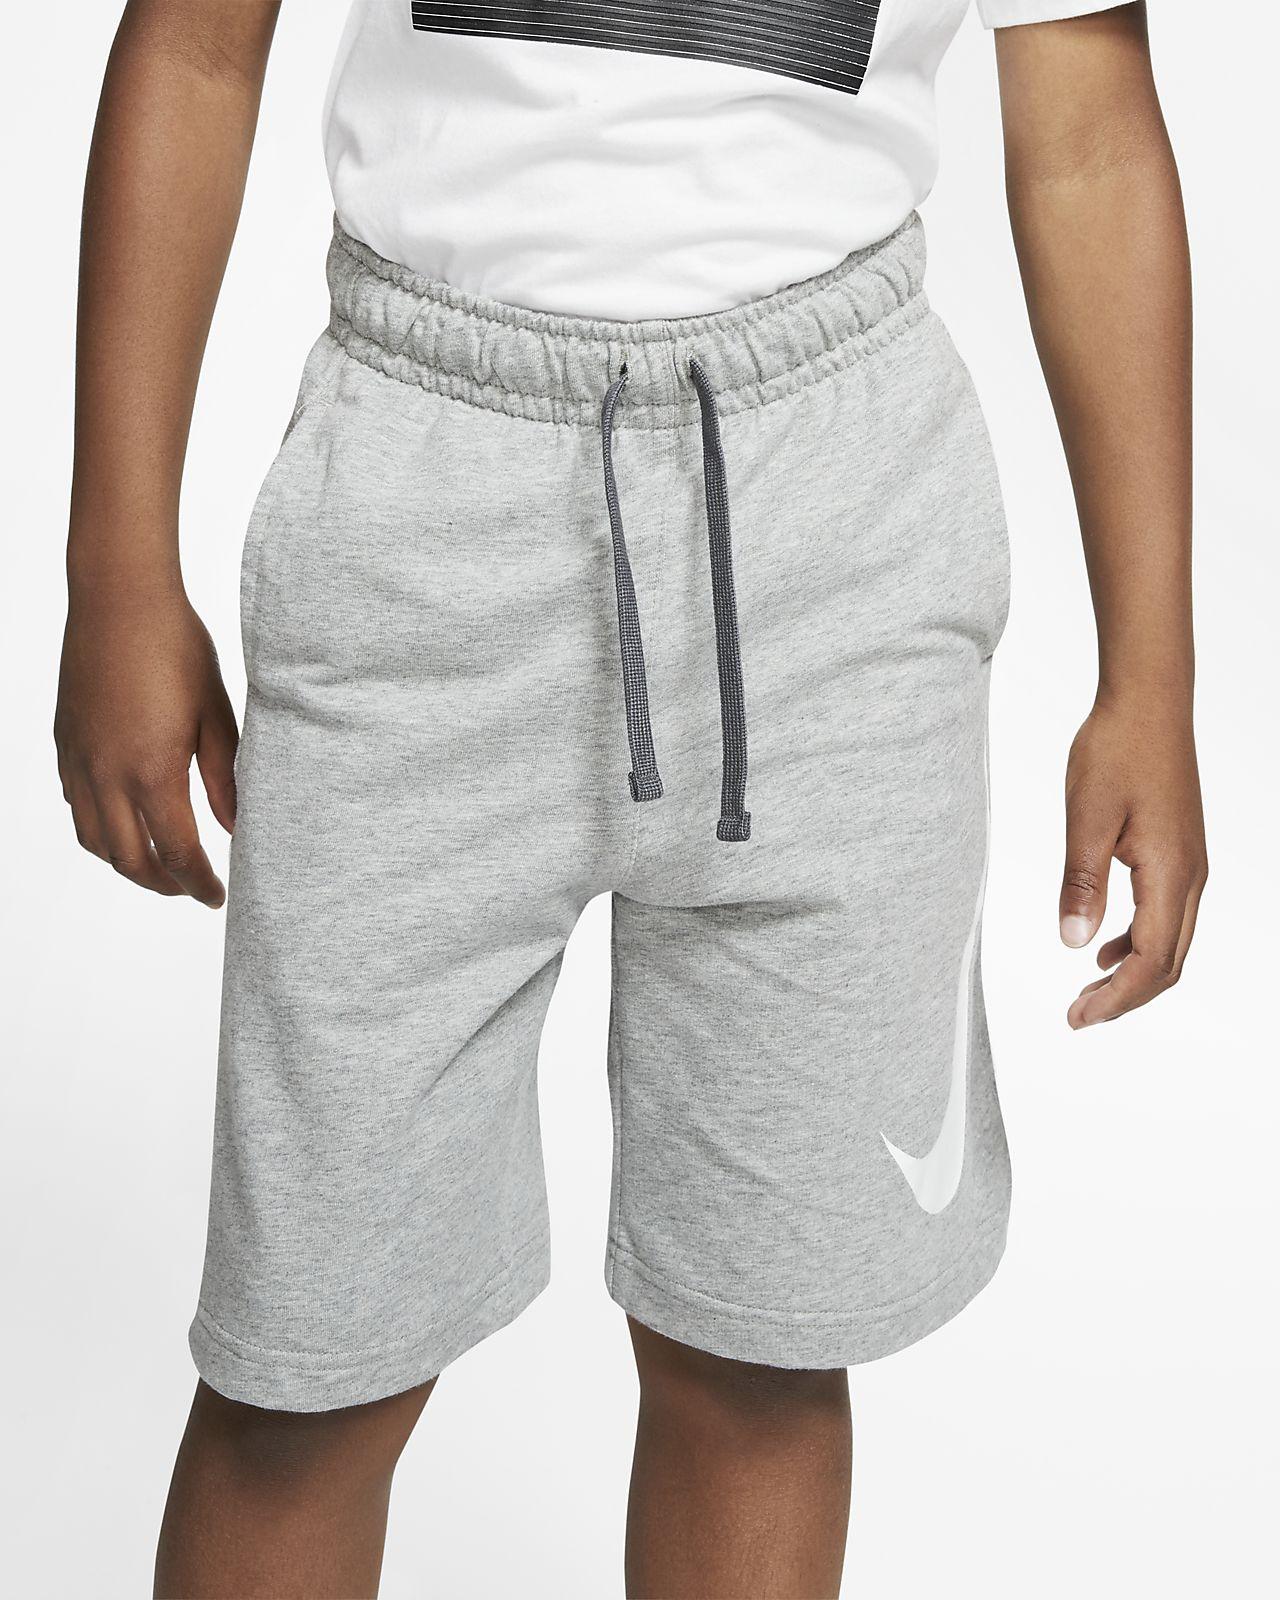 Nike Sportswear Boys' French Terry Shorts